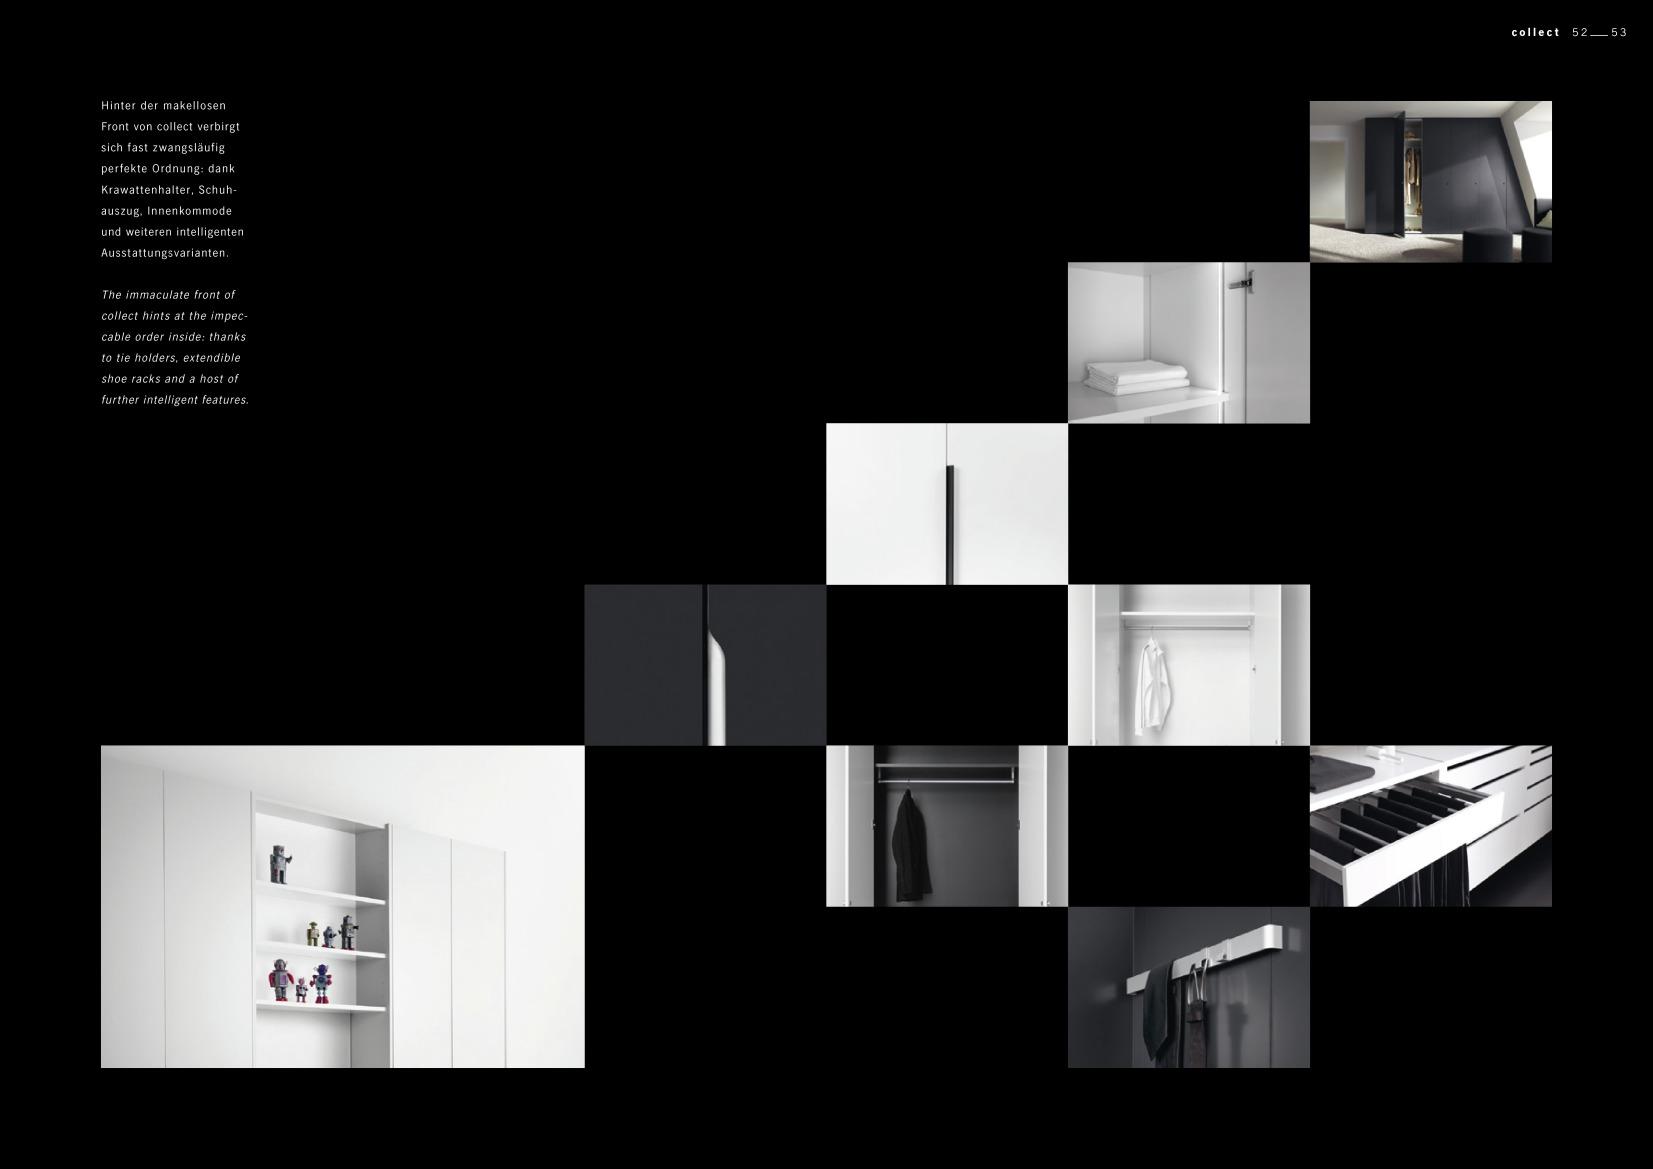 interluebke lookbook 2017 gs 25 m bel weber neustadt landau karlsruhe. Black Bedroom Furniture Sets. Home Design Ideas